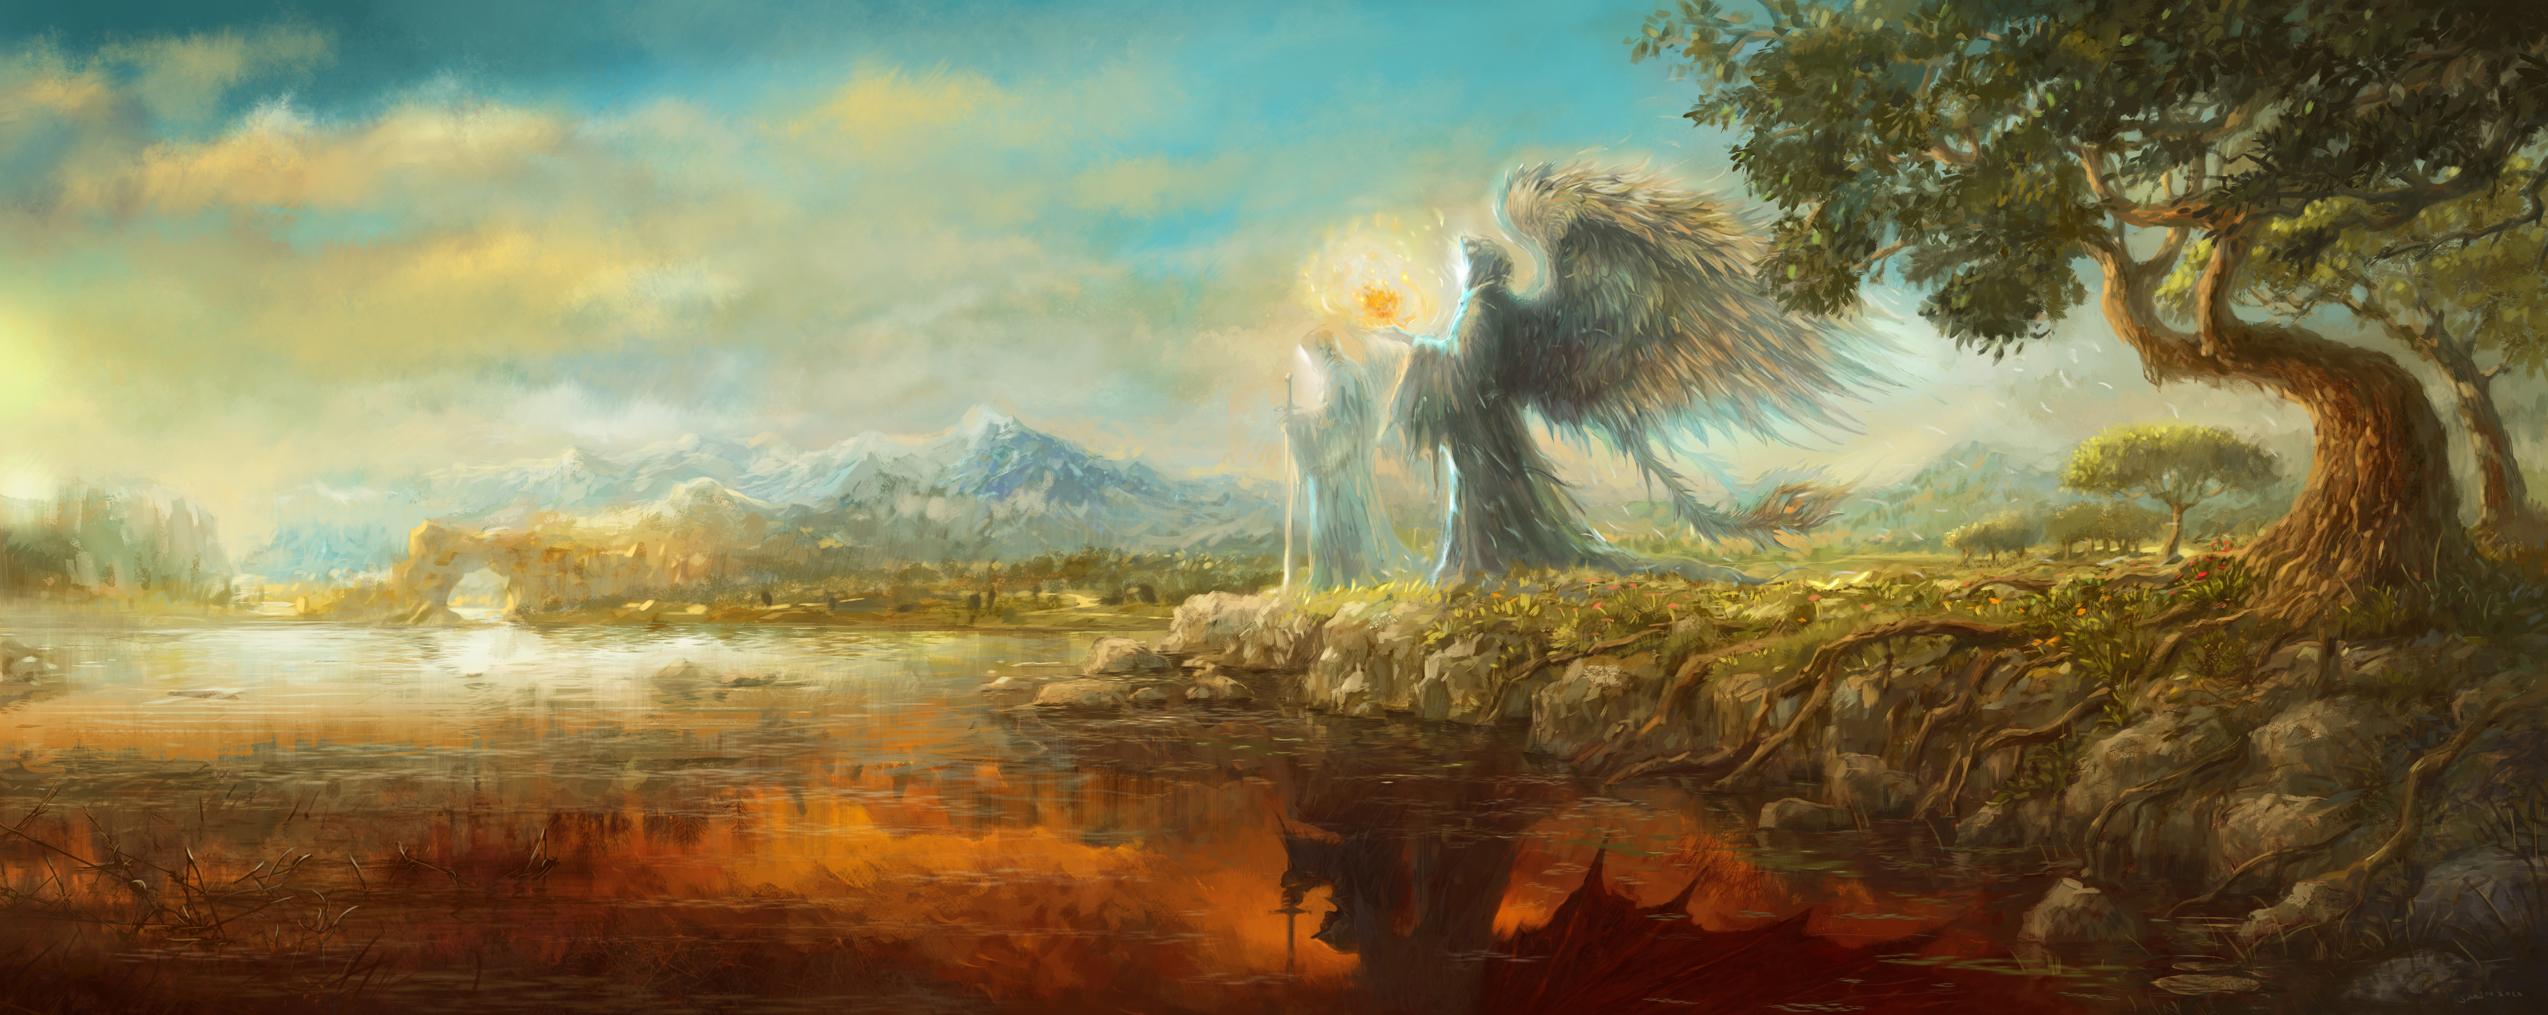 Between Heaven and Hell by sabin-boykinov on DeviantArt